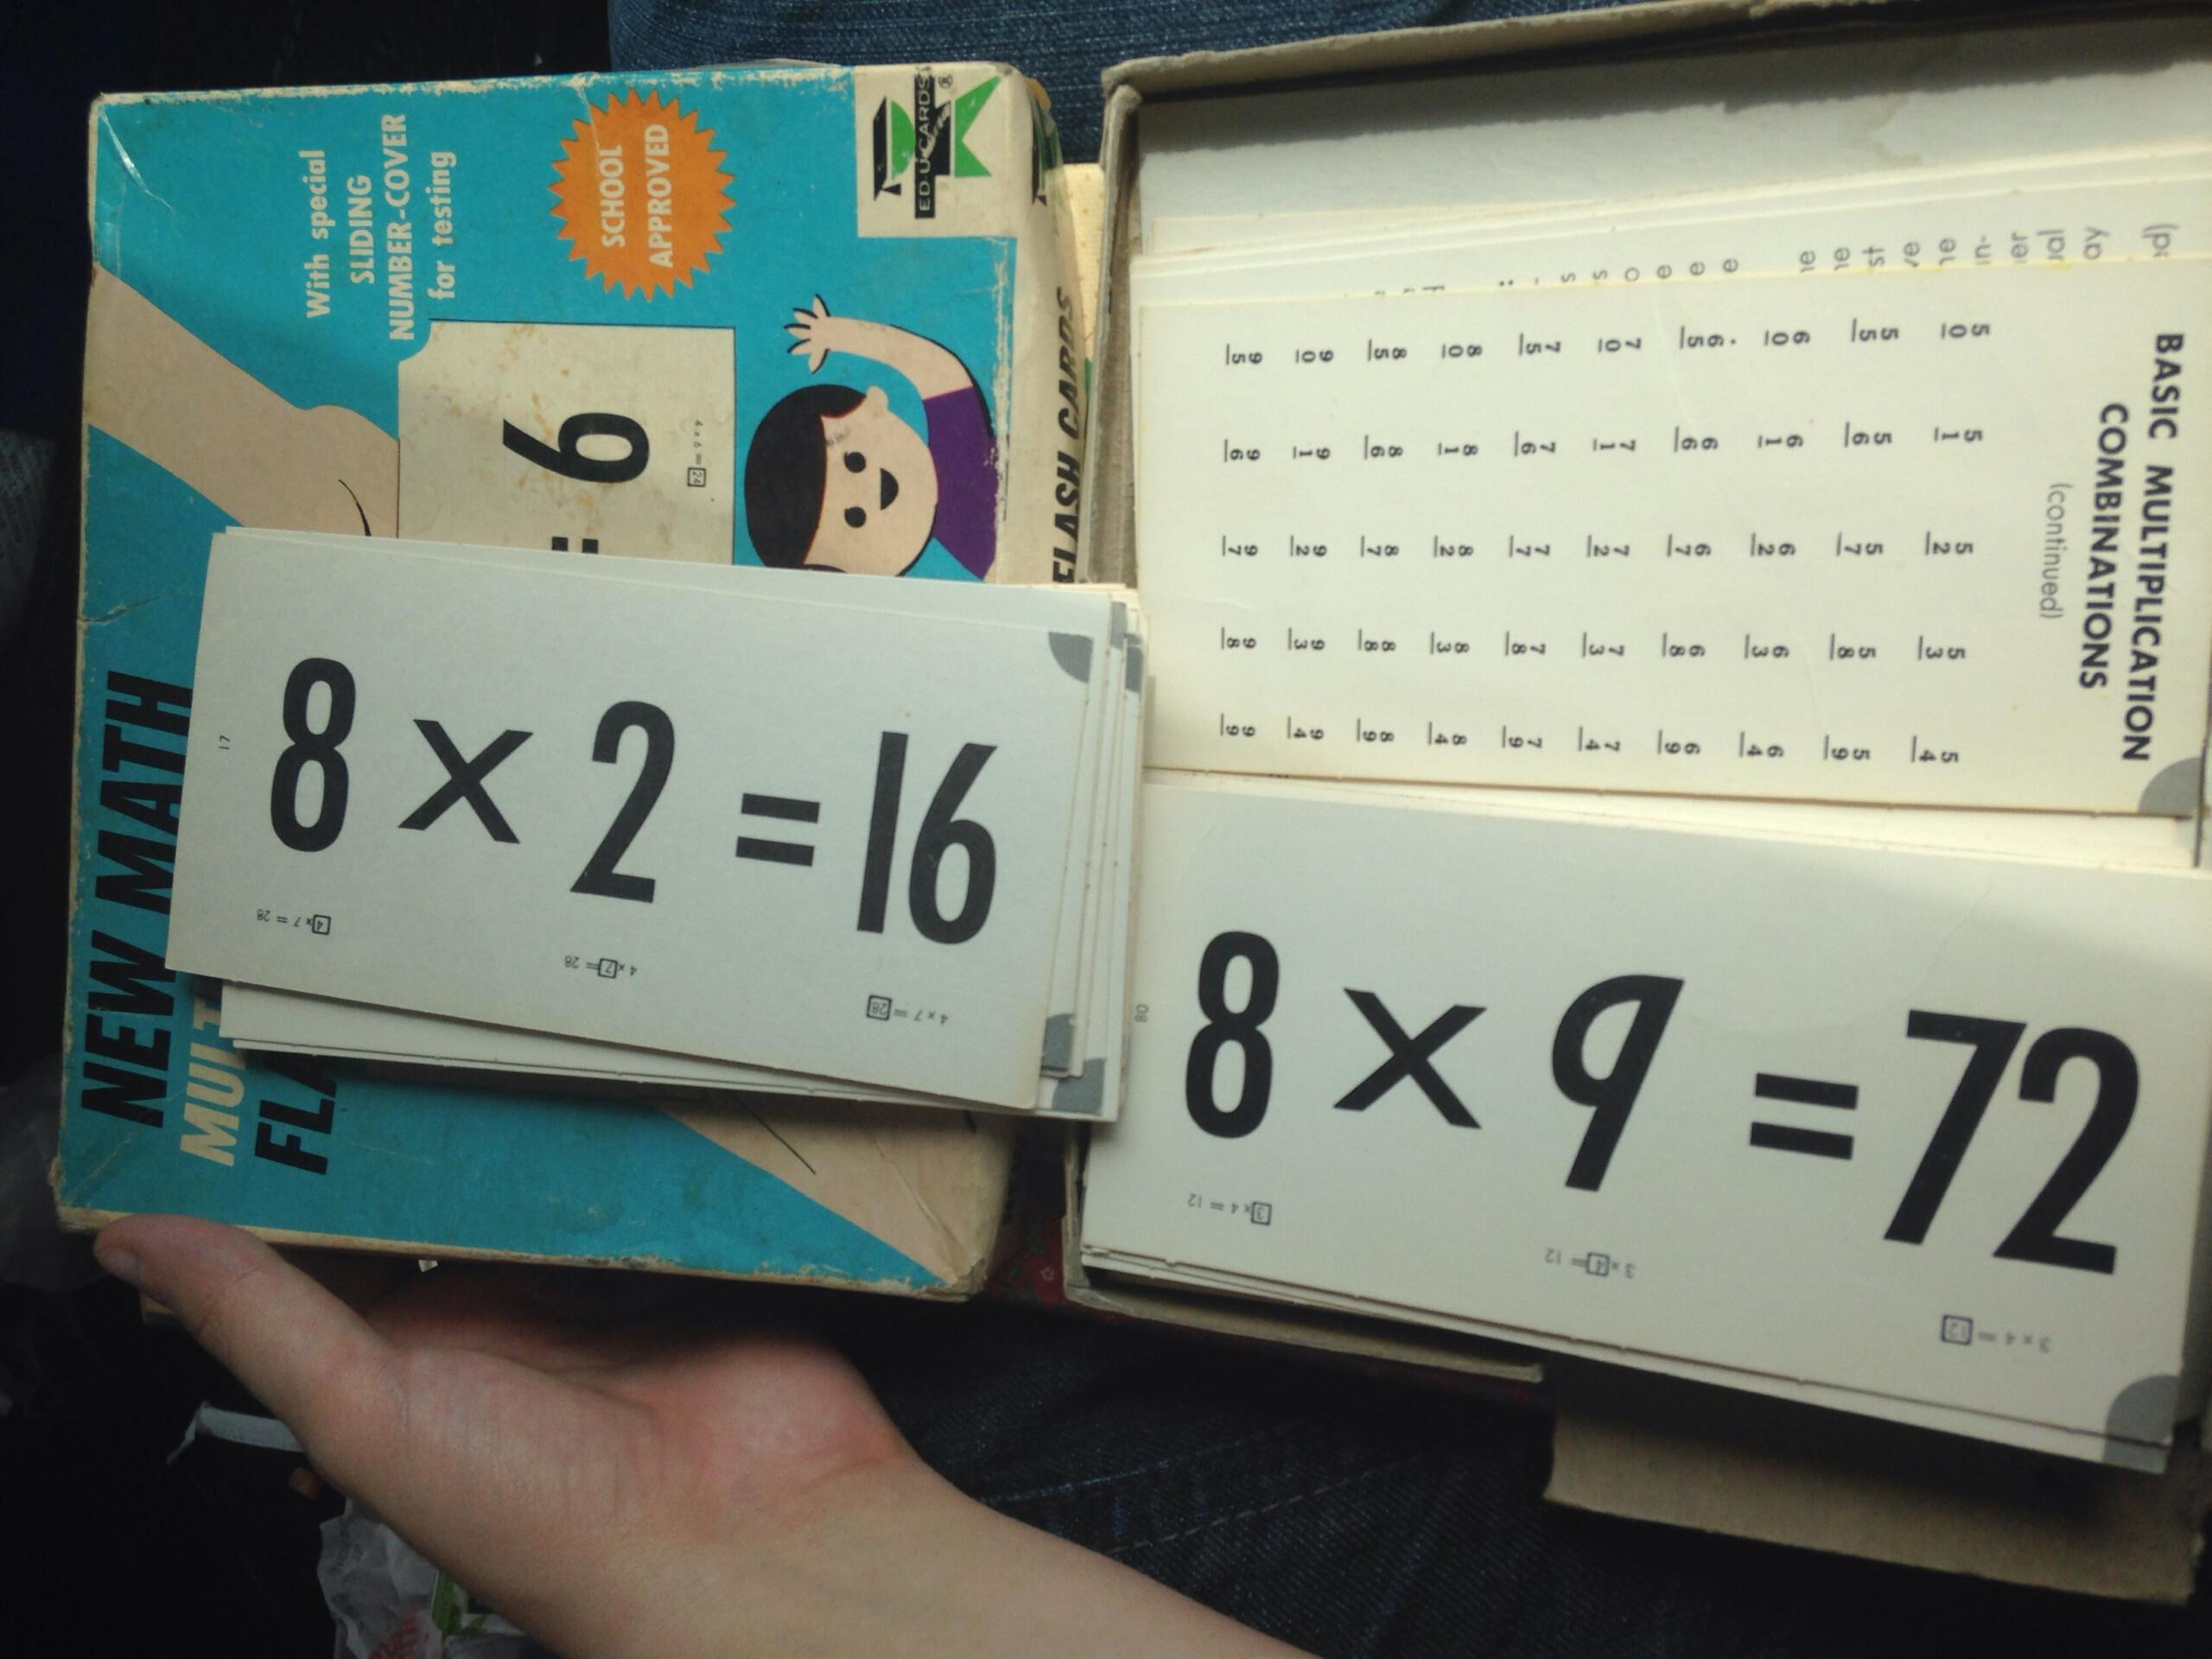 New Math Multiplication Flash Cards Vintage 1966 Ed U Cards Educards  Ed-U-Cards Educational Flash Card Game Soldlittlekittencreations